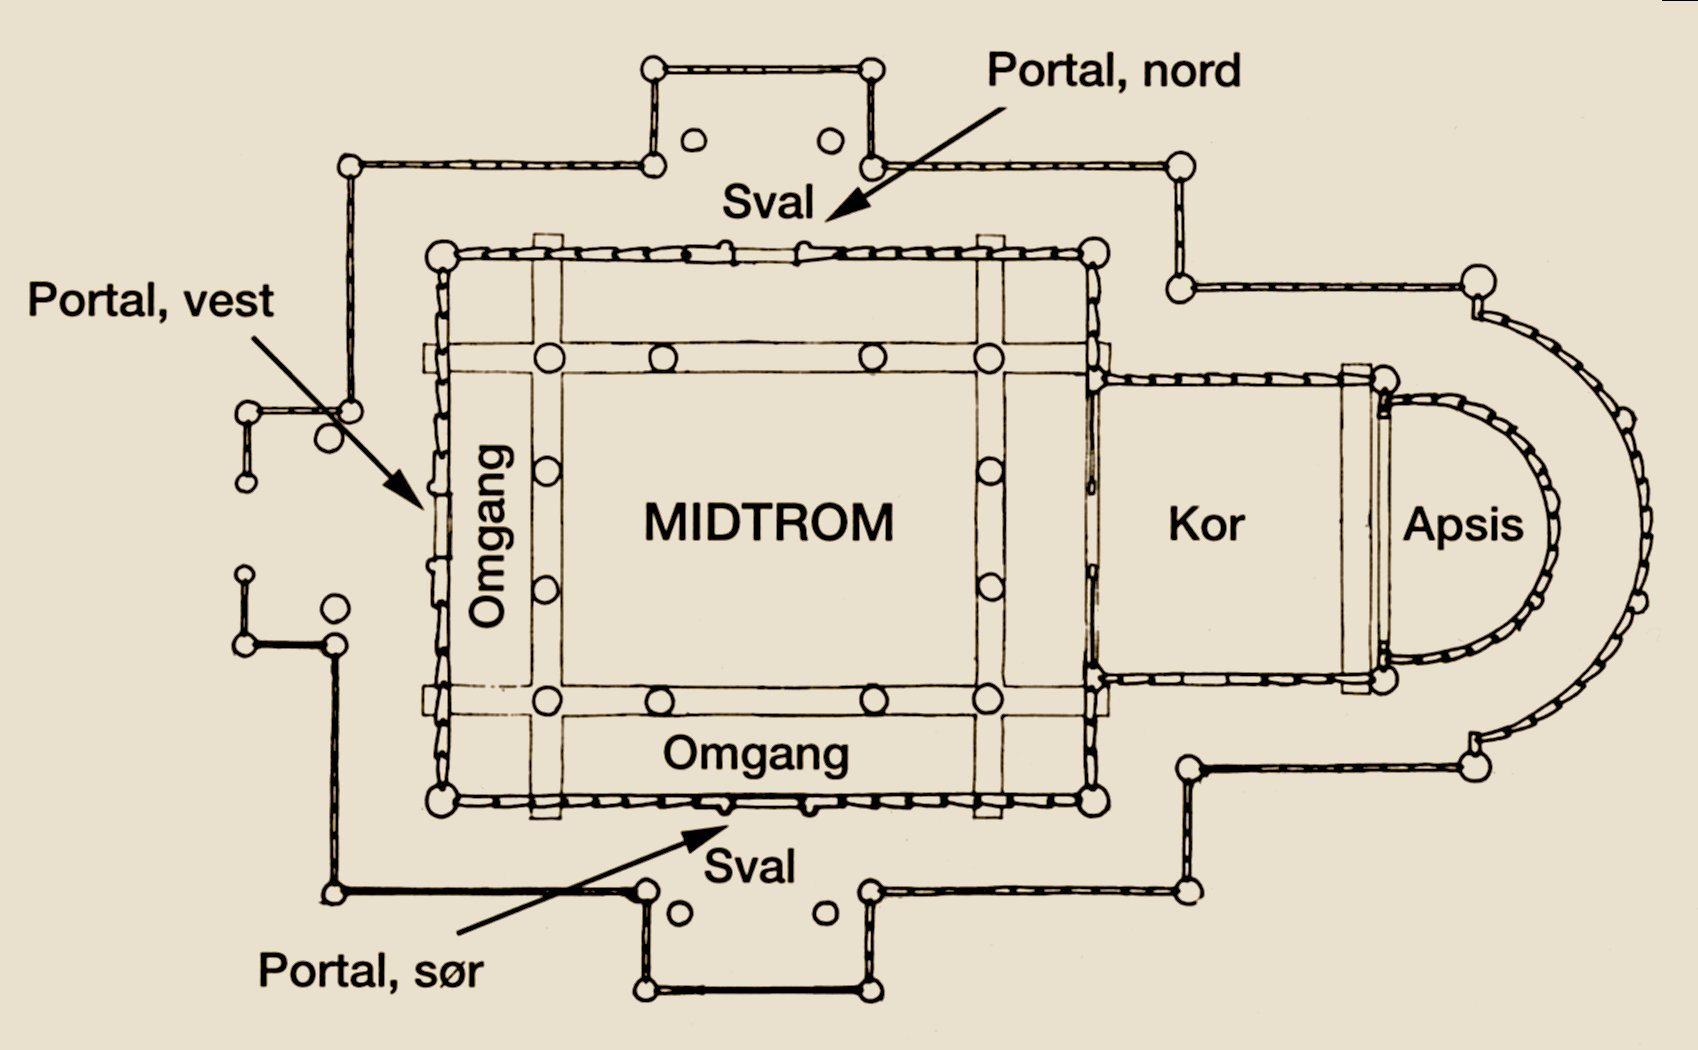 file grunnplan stavkirke h kon christie jpg wikimedia commons file grunnplan stavkirke h kon christie jpg